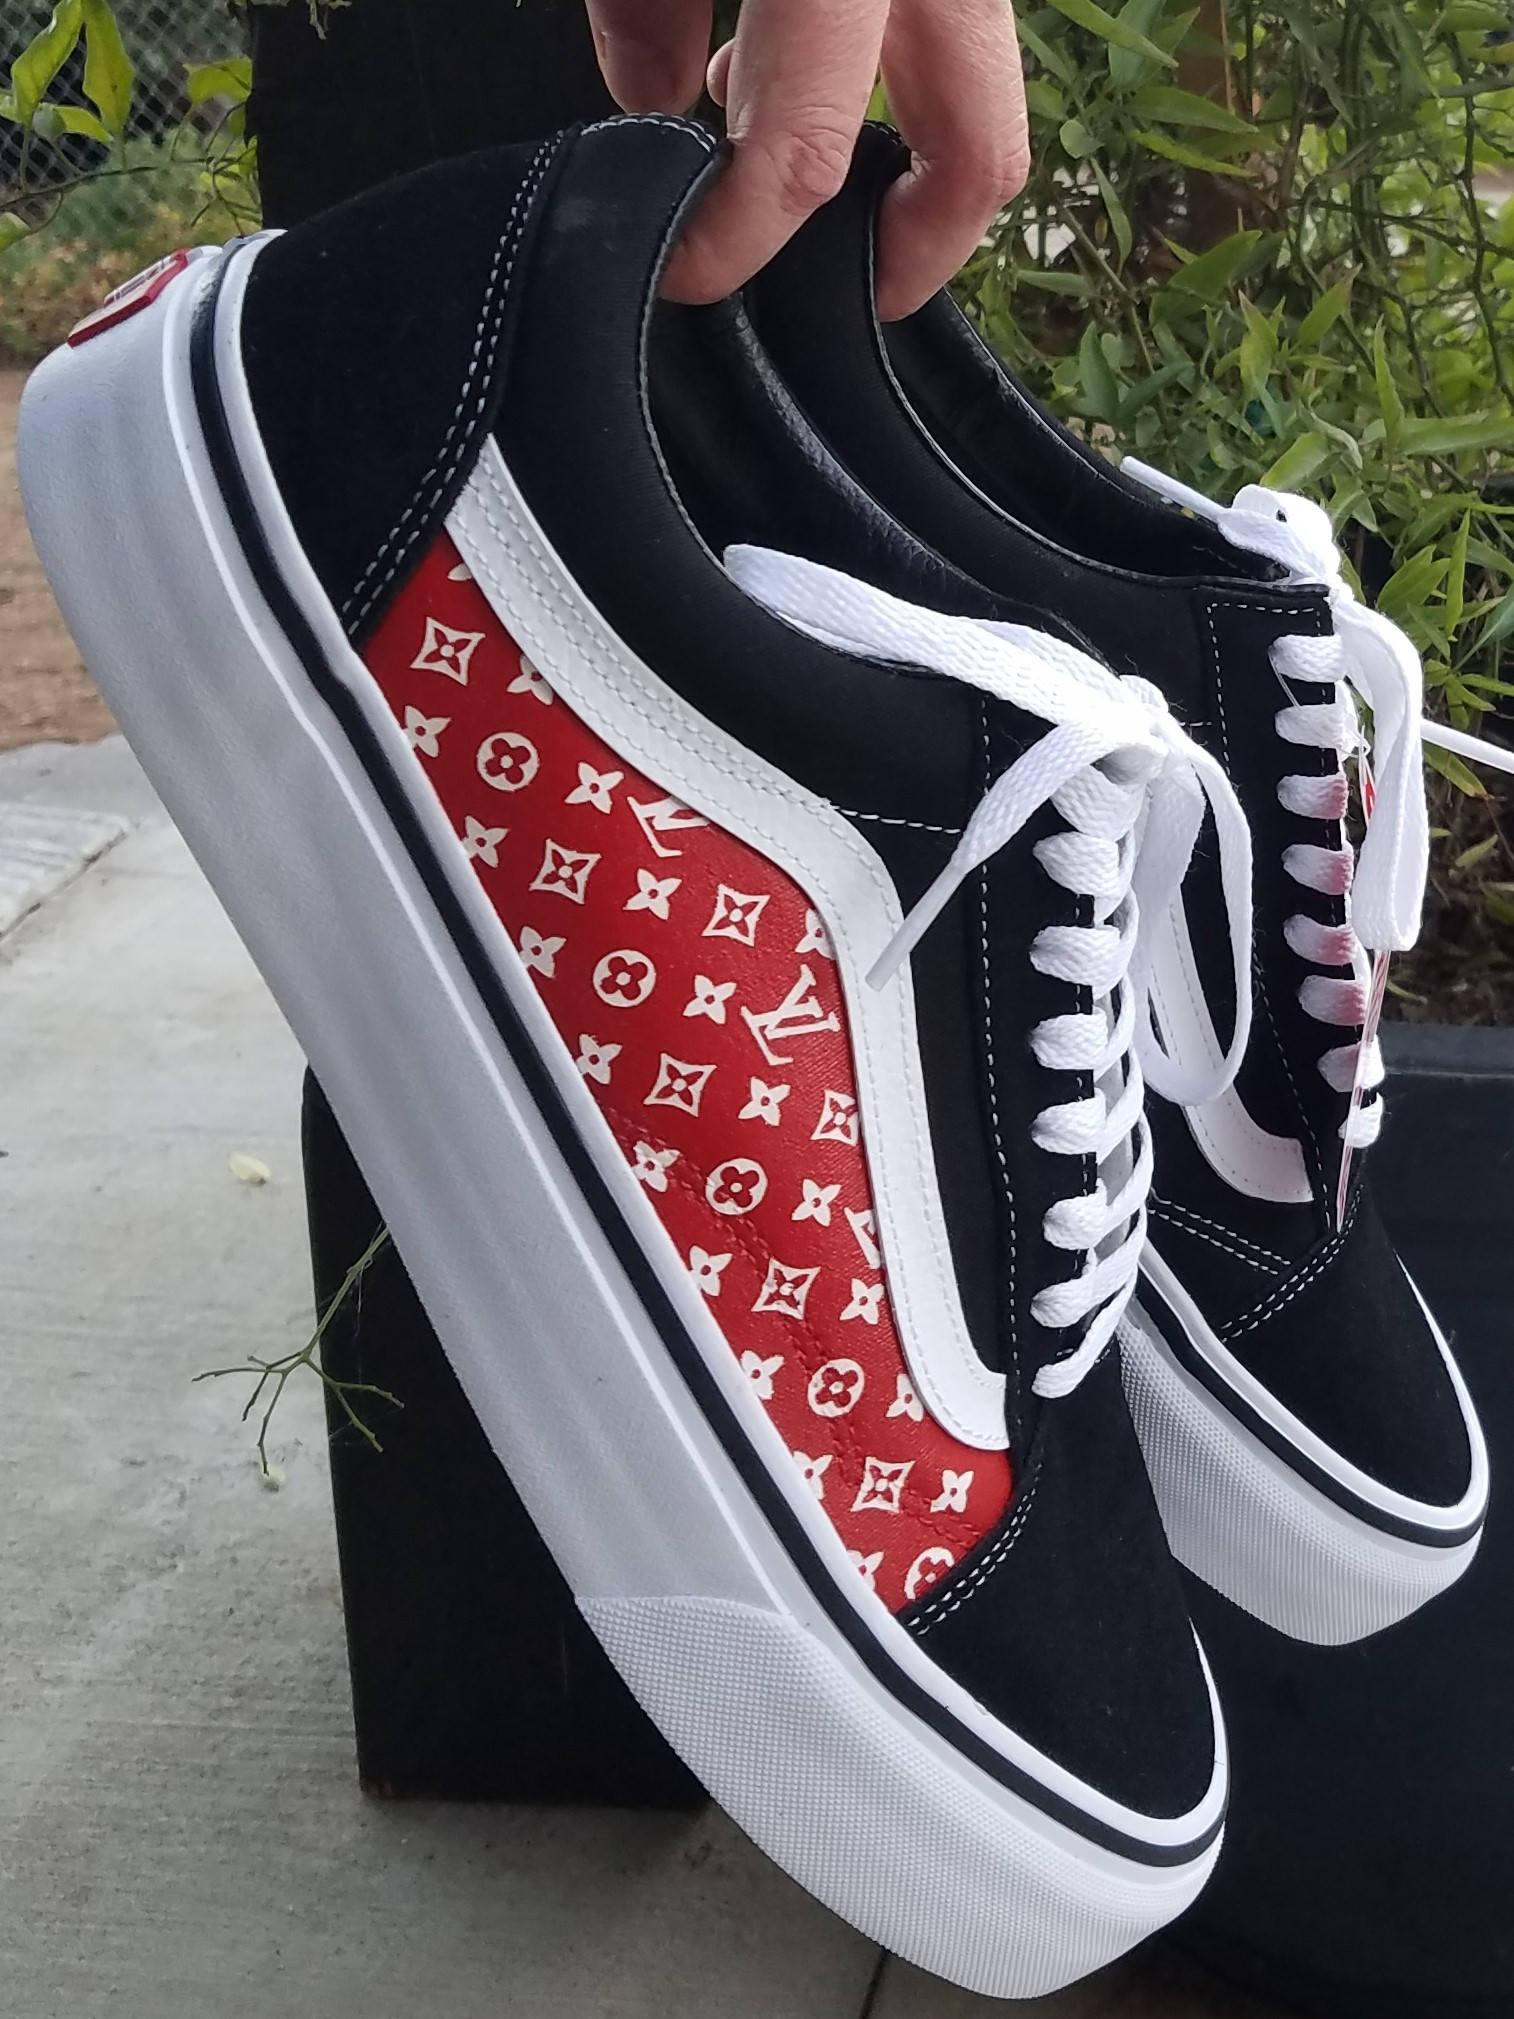 Custom Louis Vuitton Vans Shoes  38dbed3b4